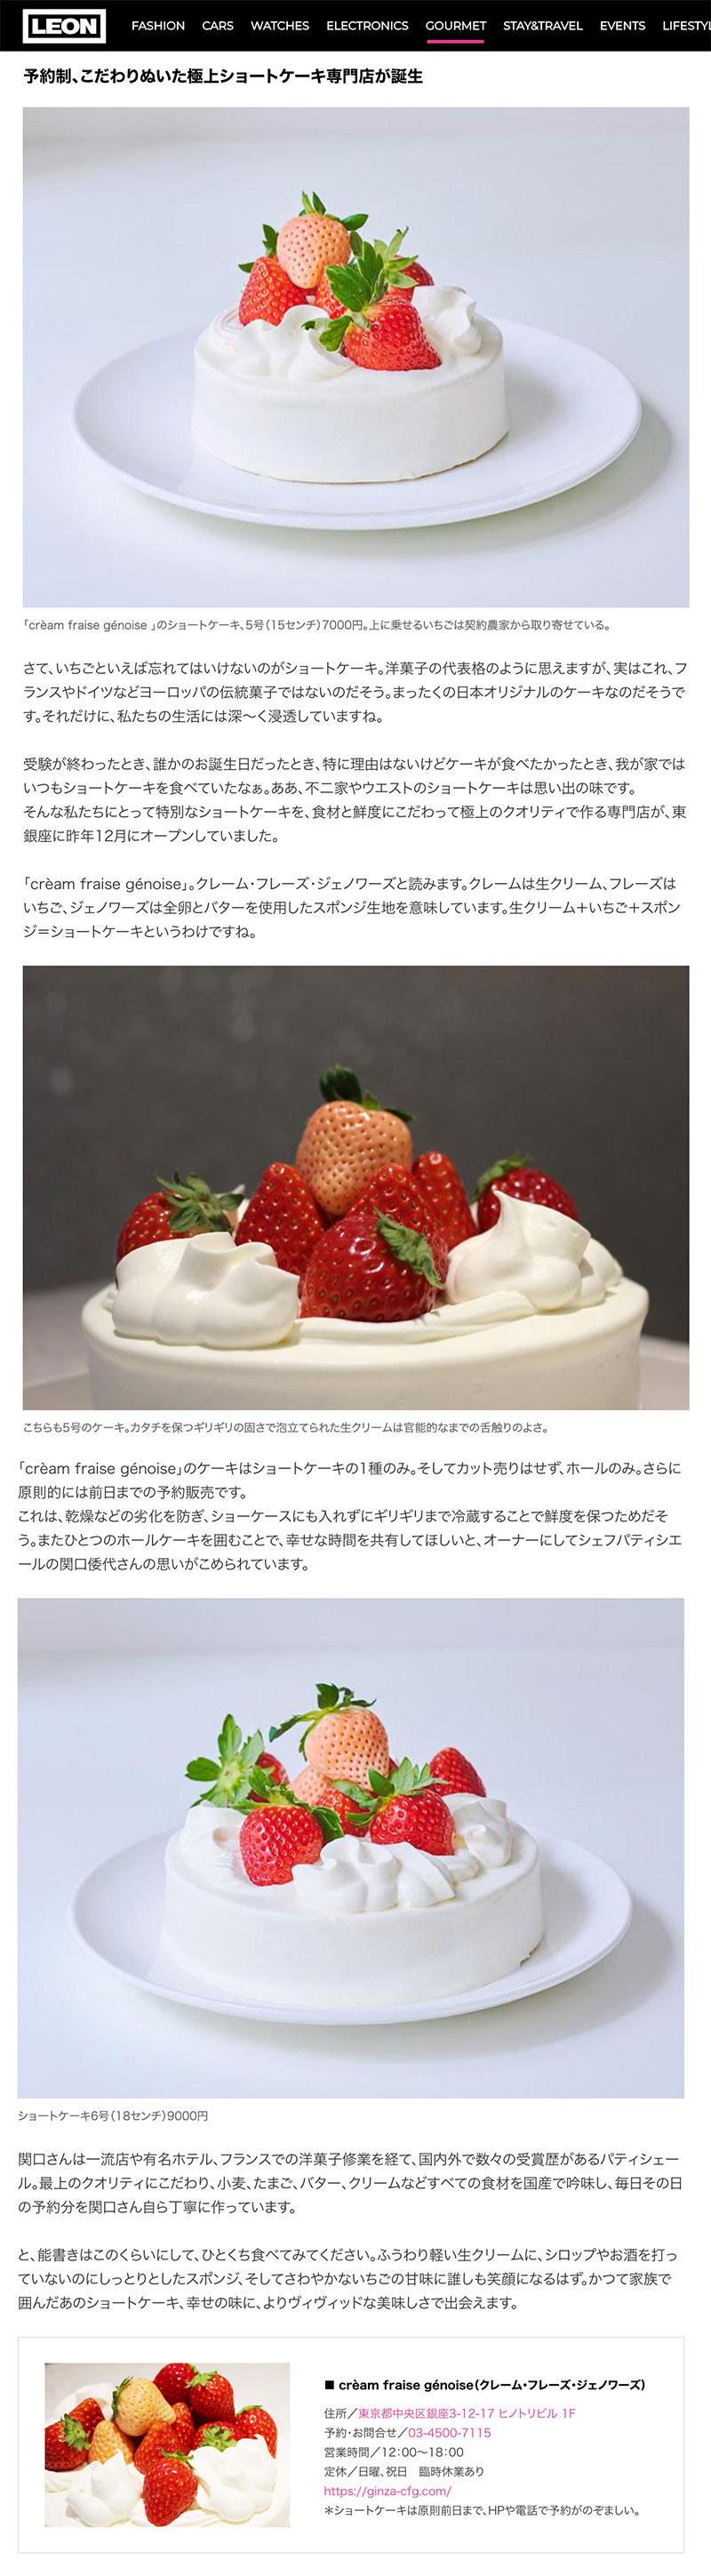 LEON『予約制、こだわりぬいた極上ショートケーキ専門店が誕生』